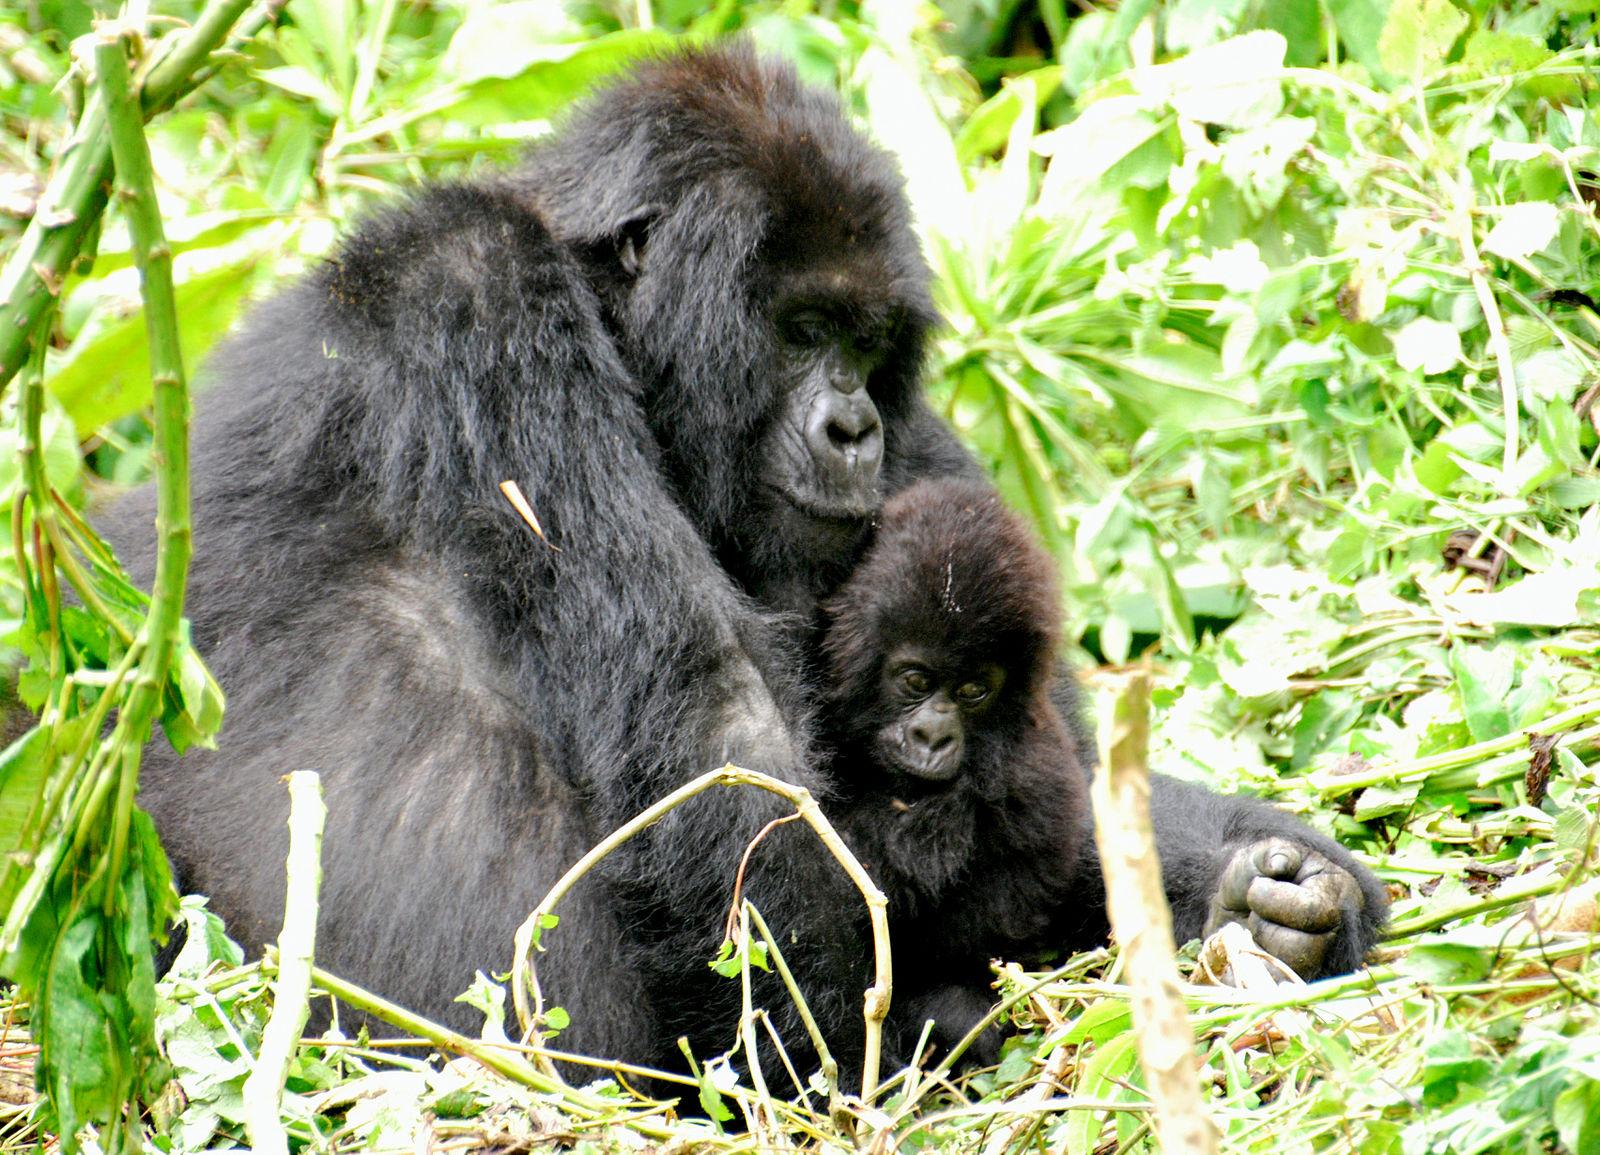 Heartwarming Video Captures Gorilla Helping Injured Bird